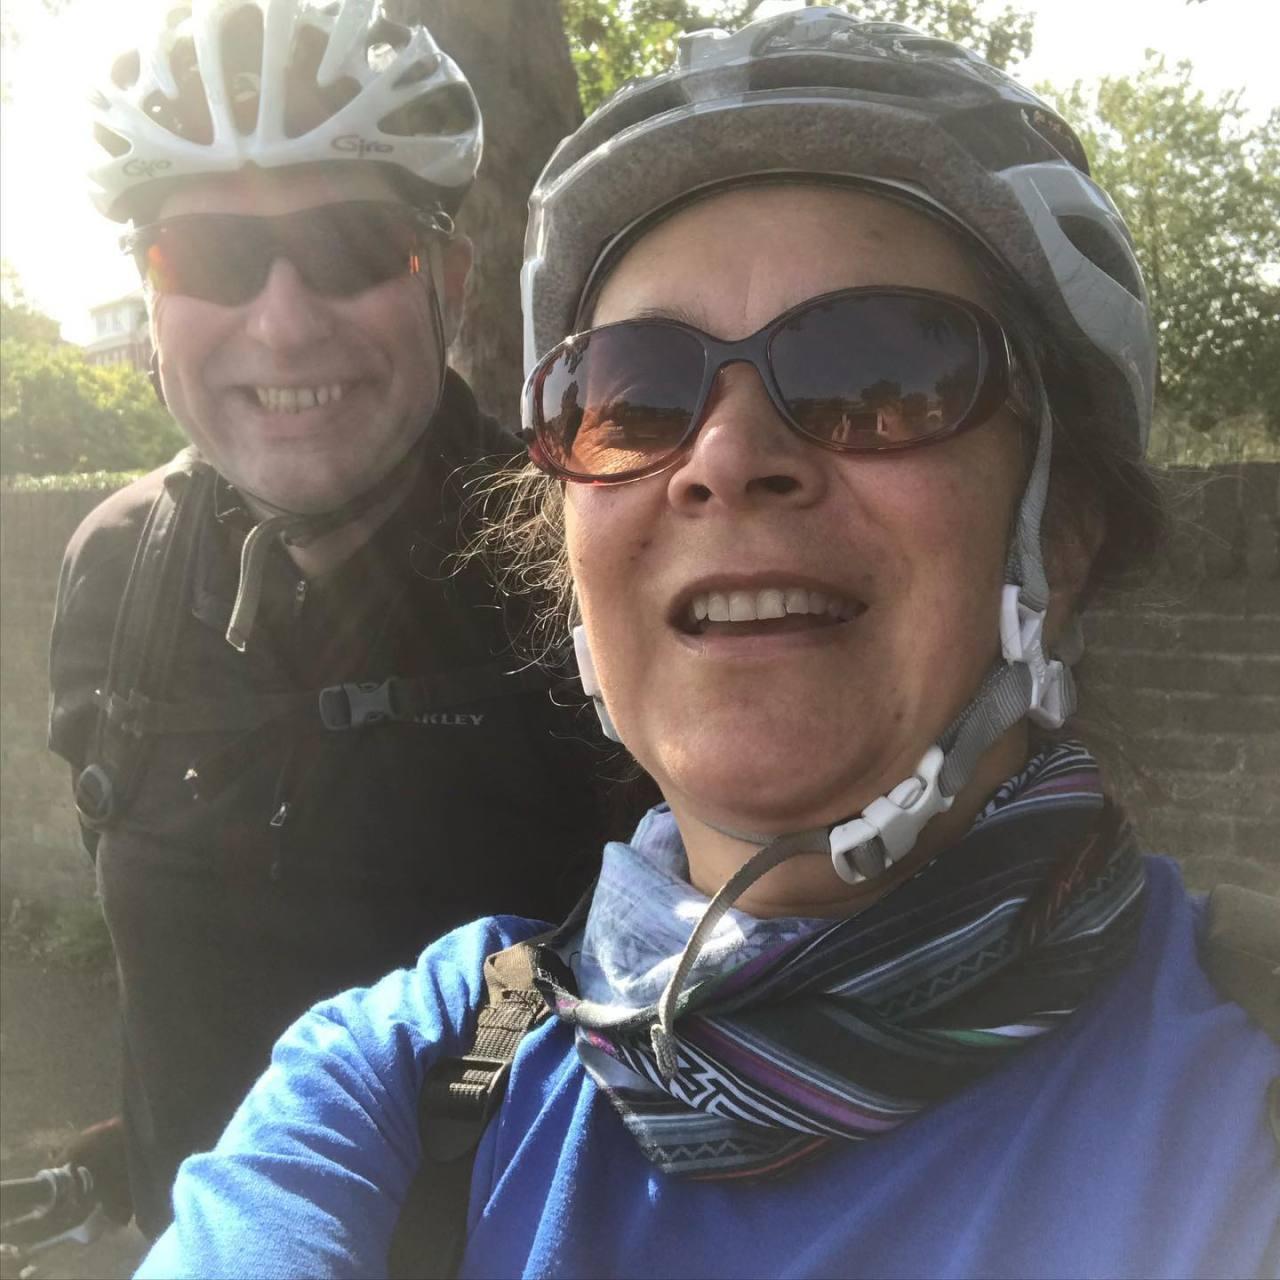 Out cycling in Richmond People taken by @officeoffin #London #londonist #londoner #riverthames #Richmond https://instagr.am/p/CFUOpYNjgpl/ #IFTTT#Instagram